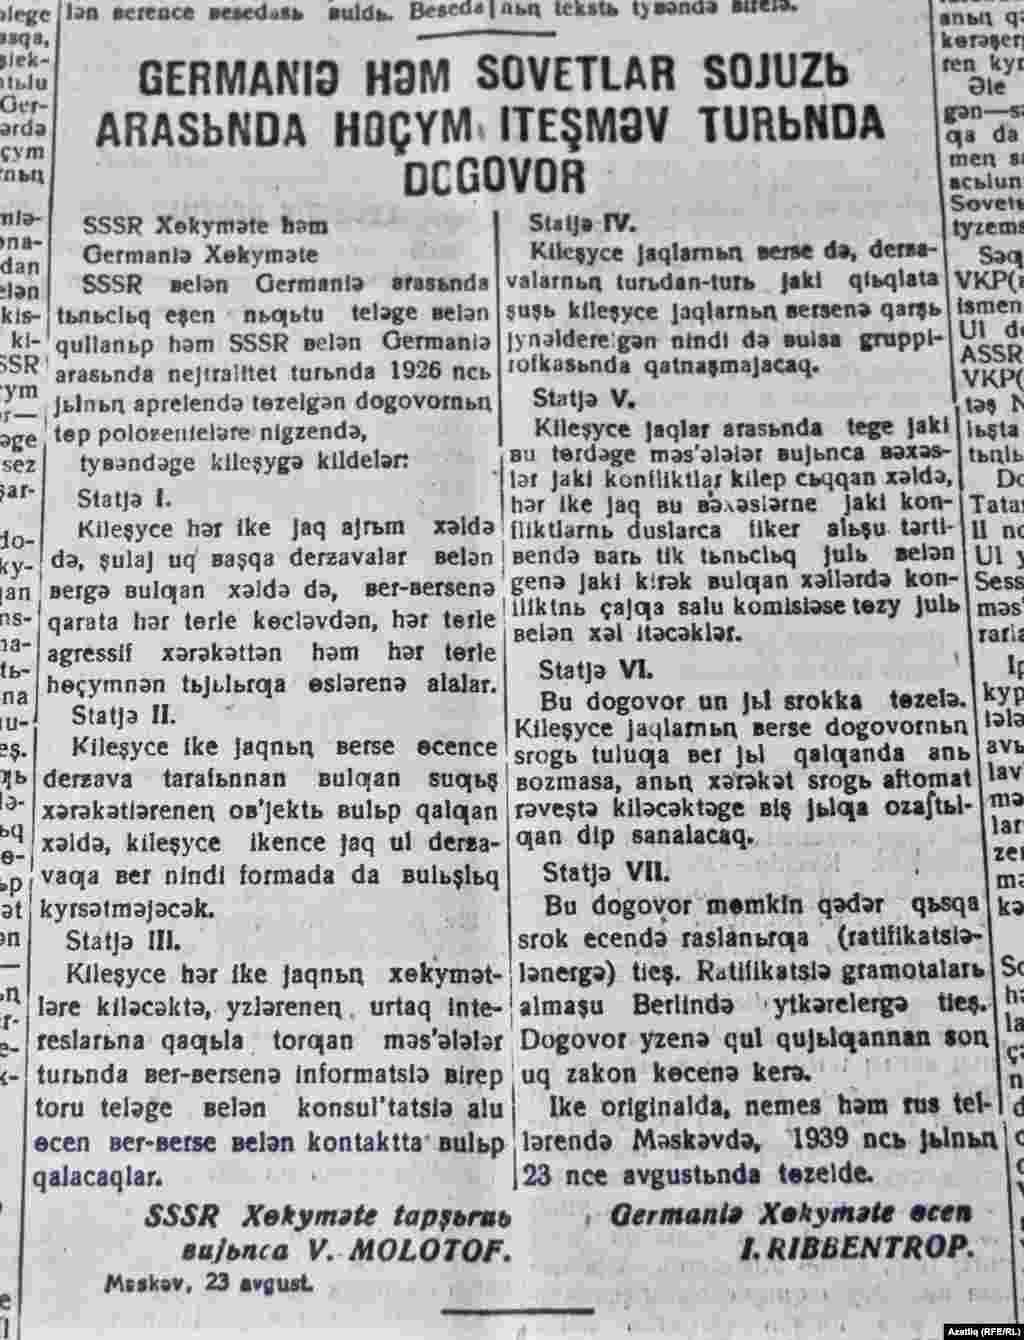 "1939 елның 23 августында имзаланган килешү тексты Qьzьl Tatarstan (хәзер ""Ватаным Татарстан"") газетында да басылып чыга."